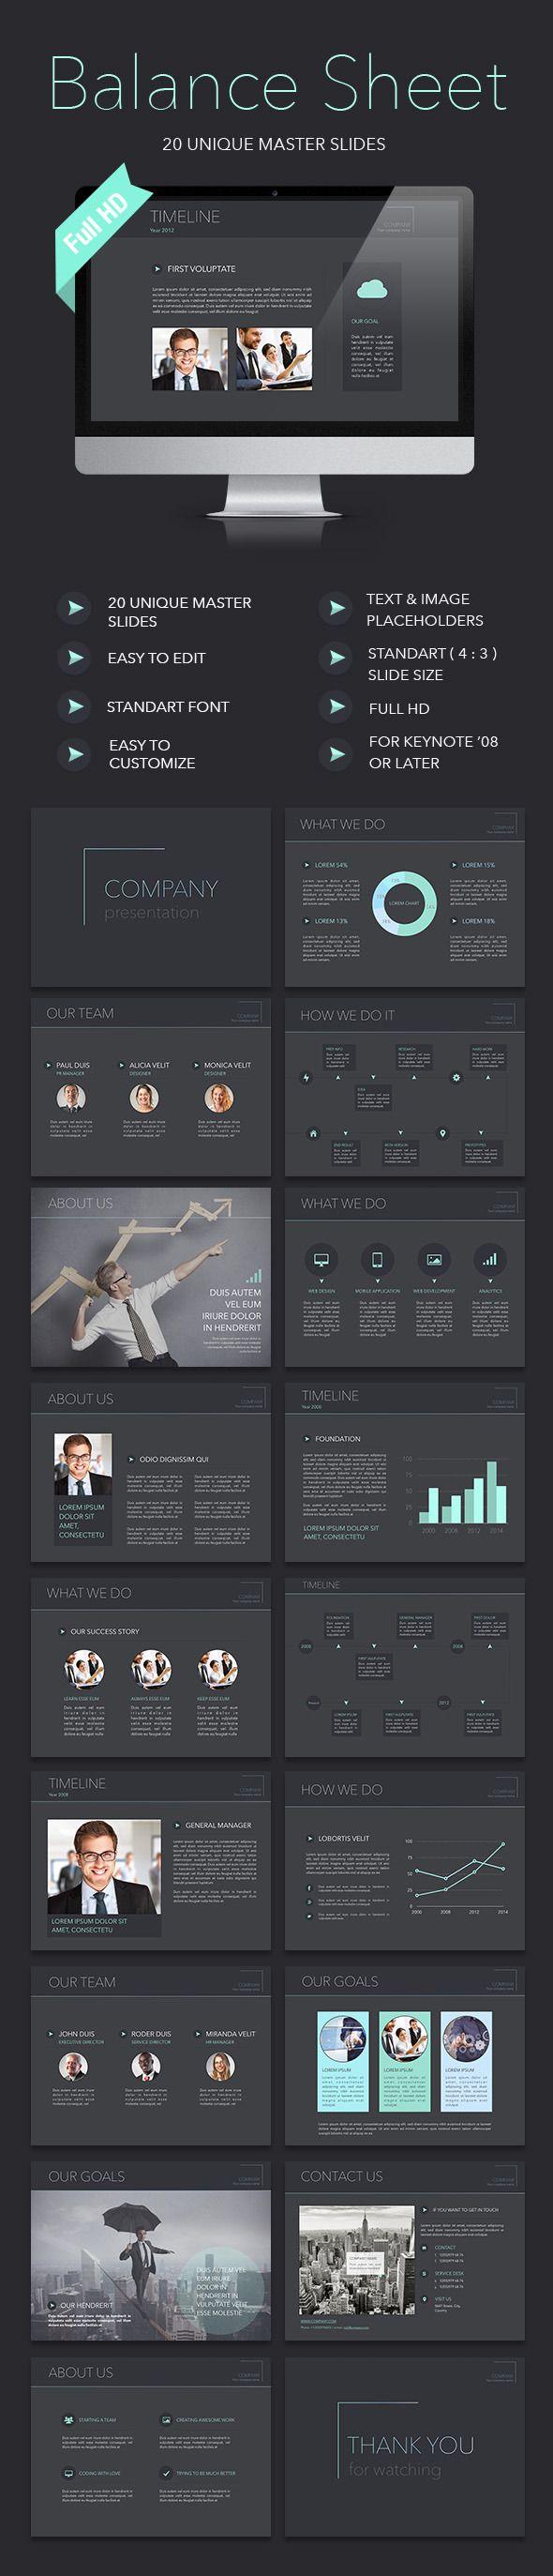 Balance Sheet Keynote Template